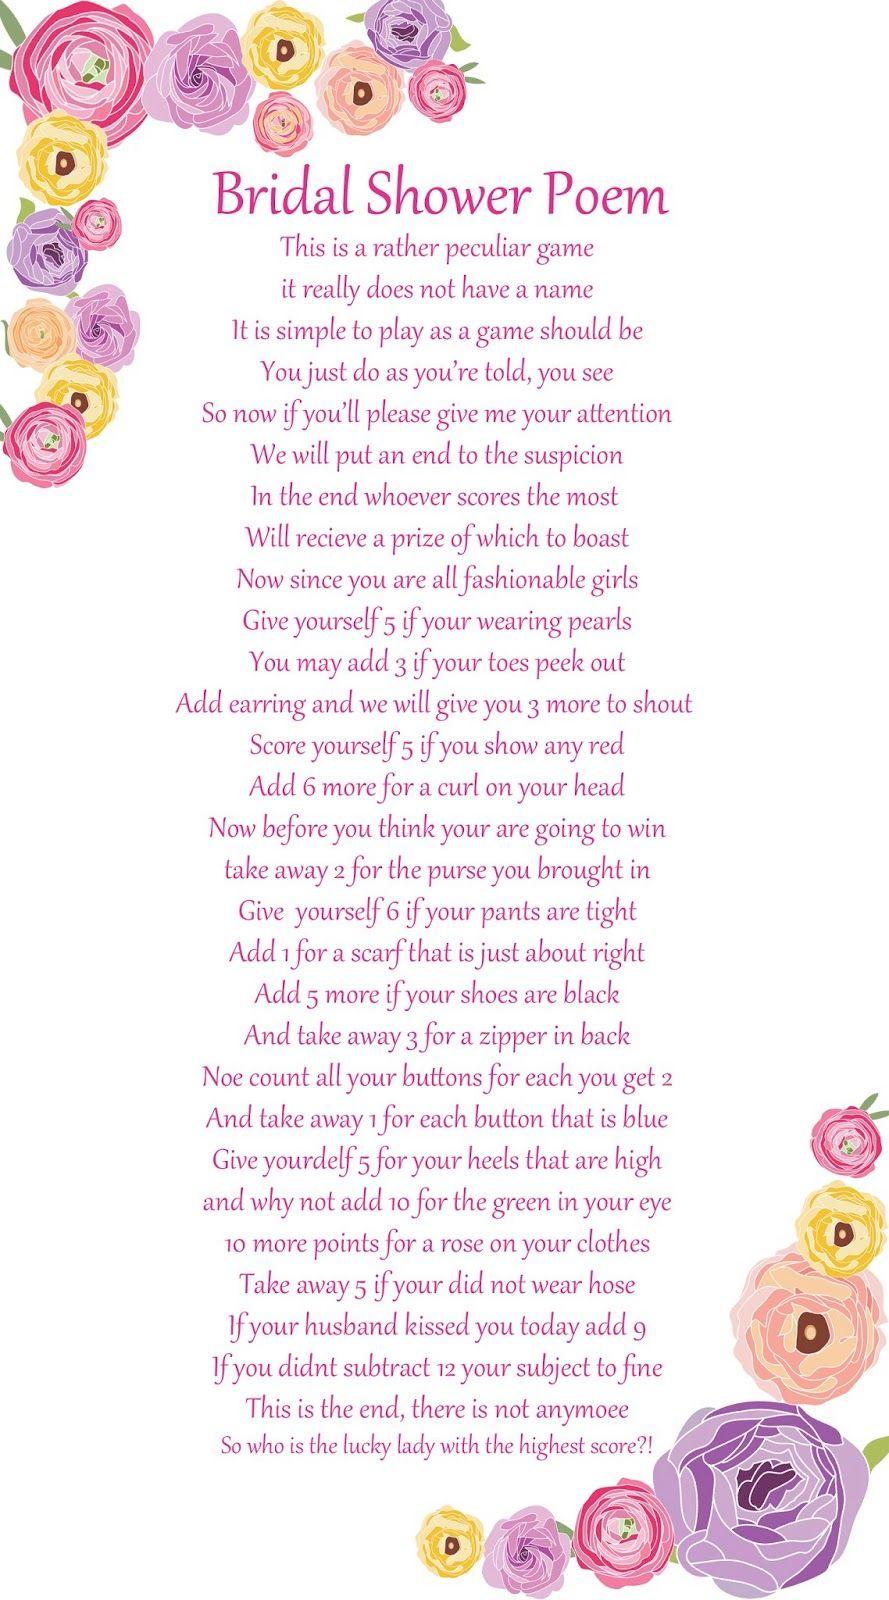 Baby Gift List Poem : Fun bridal shower games and ideas eweddingfavors